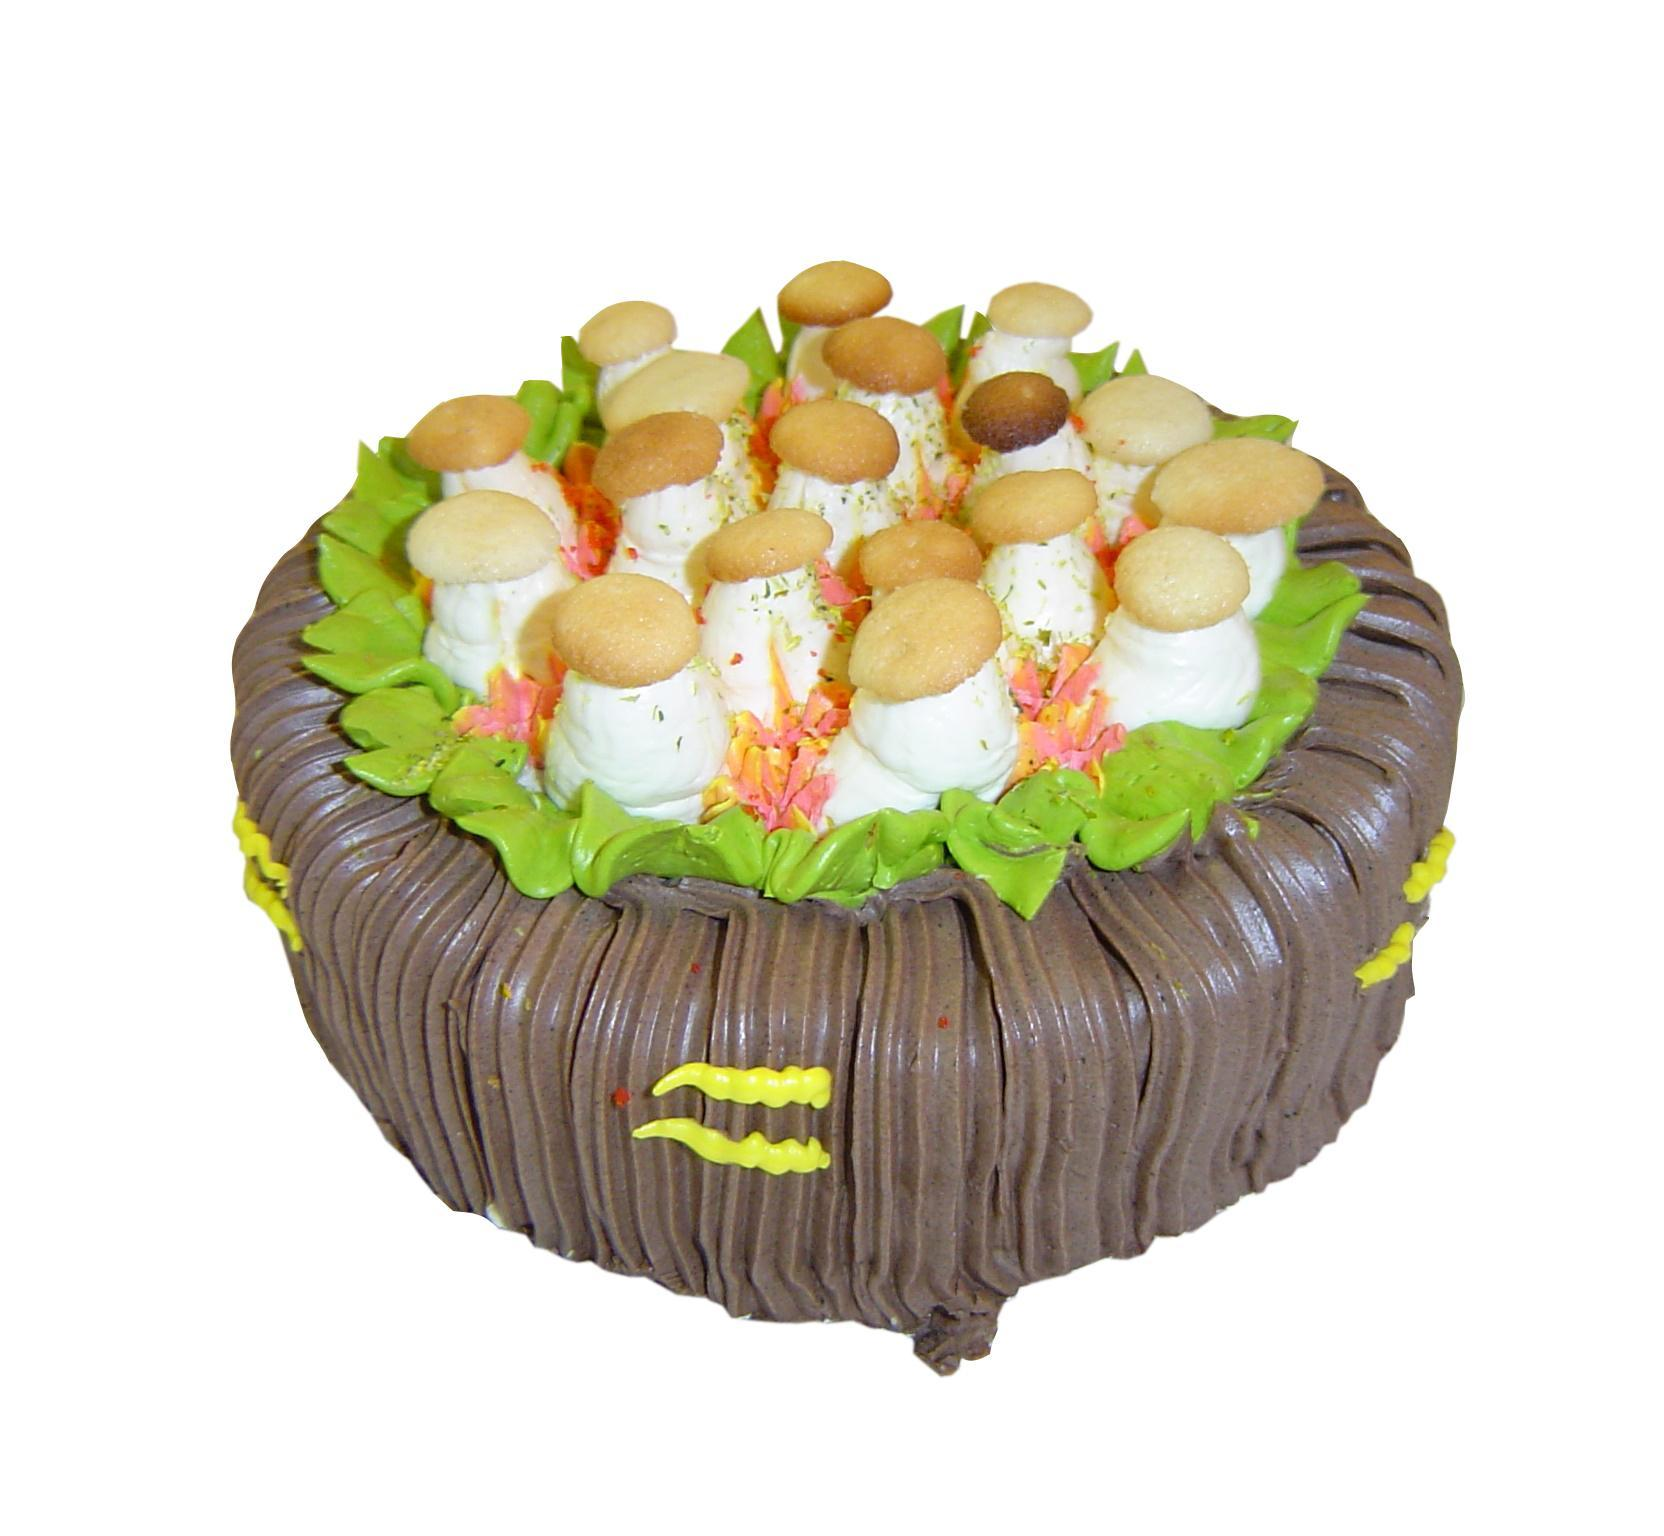 Торт Медовик Лукошко с грибами по-нижегородски